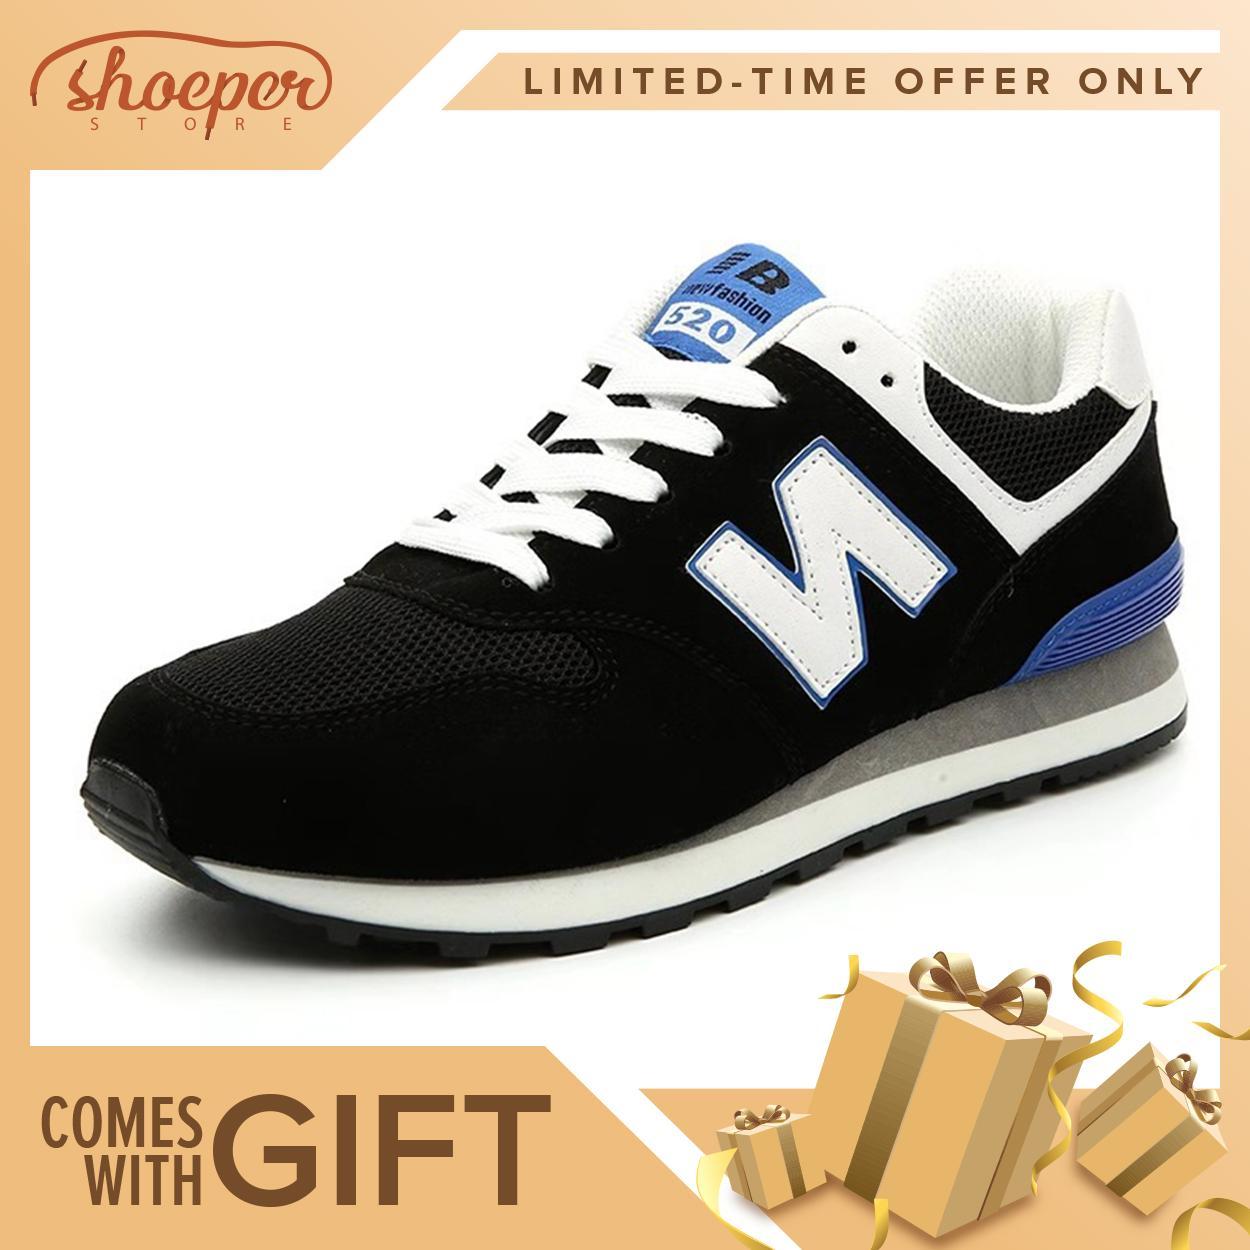 709a3cddf350 Shoes for Men for sale - Mens Fashion Shoes online brands